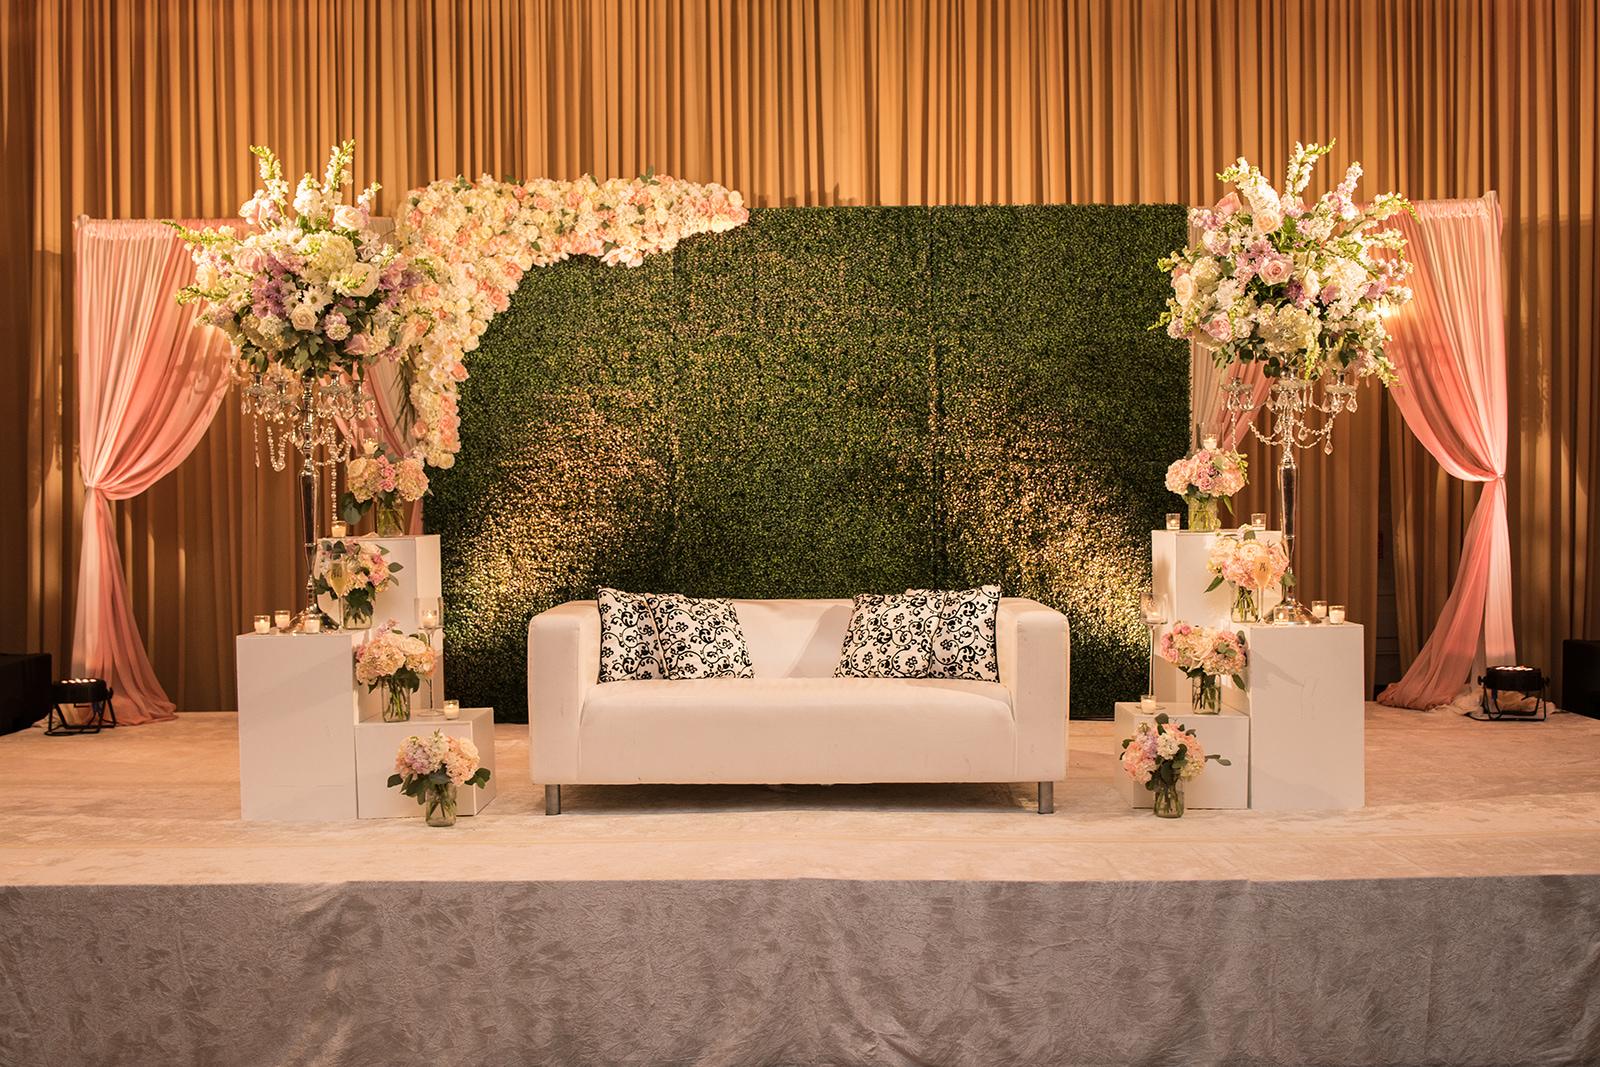 Le Cape Weddings - Sumeet and Chavi - Reception Details  -42.jpg